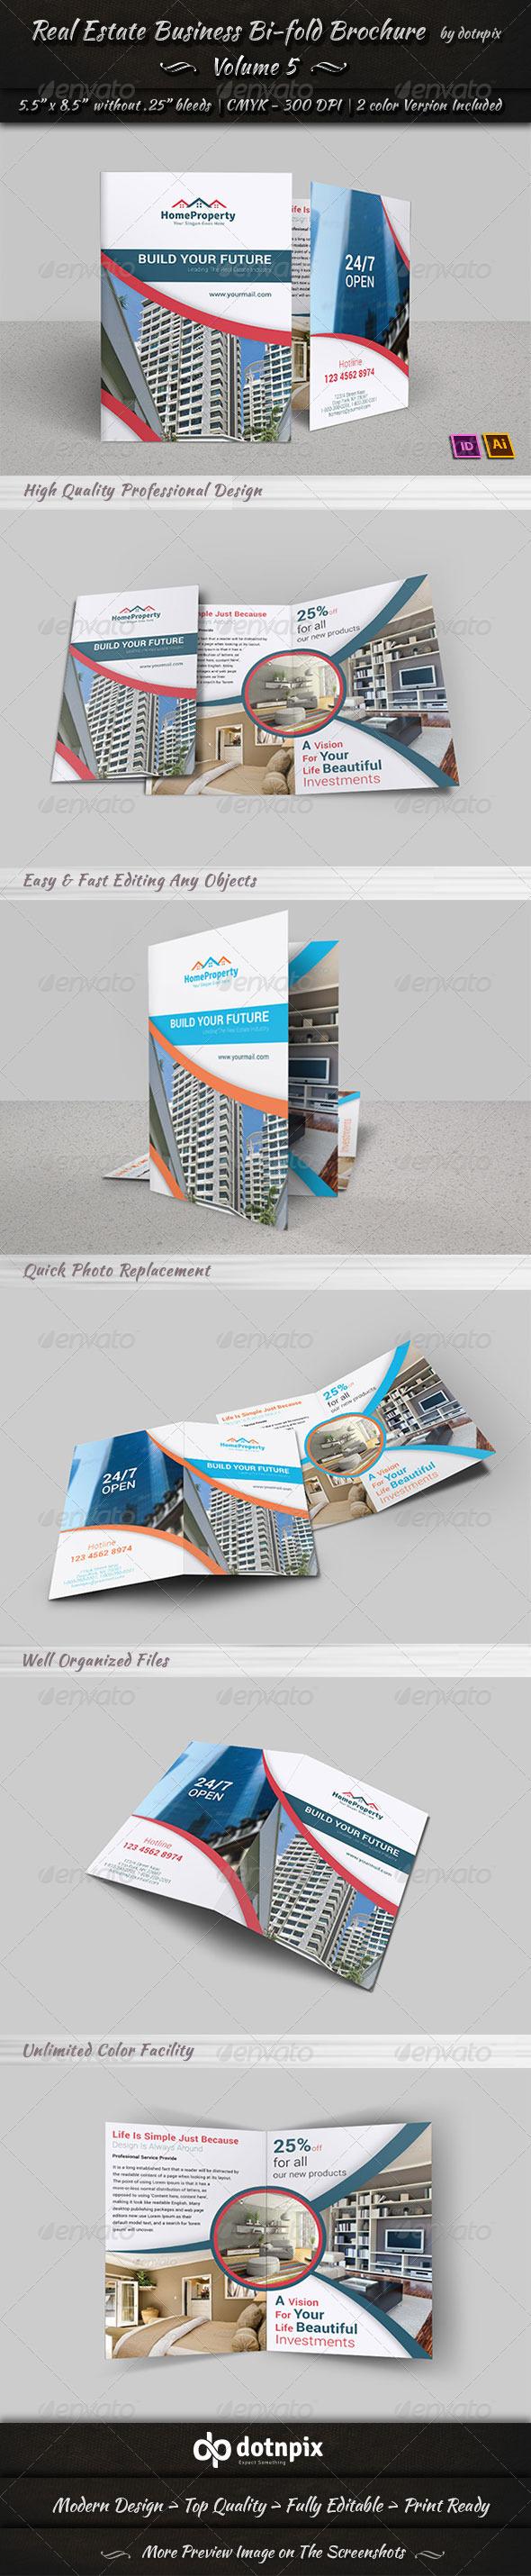 GraphicRiver Real Estate Business Bi-Fold Brochure Volume 5 6692195